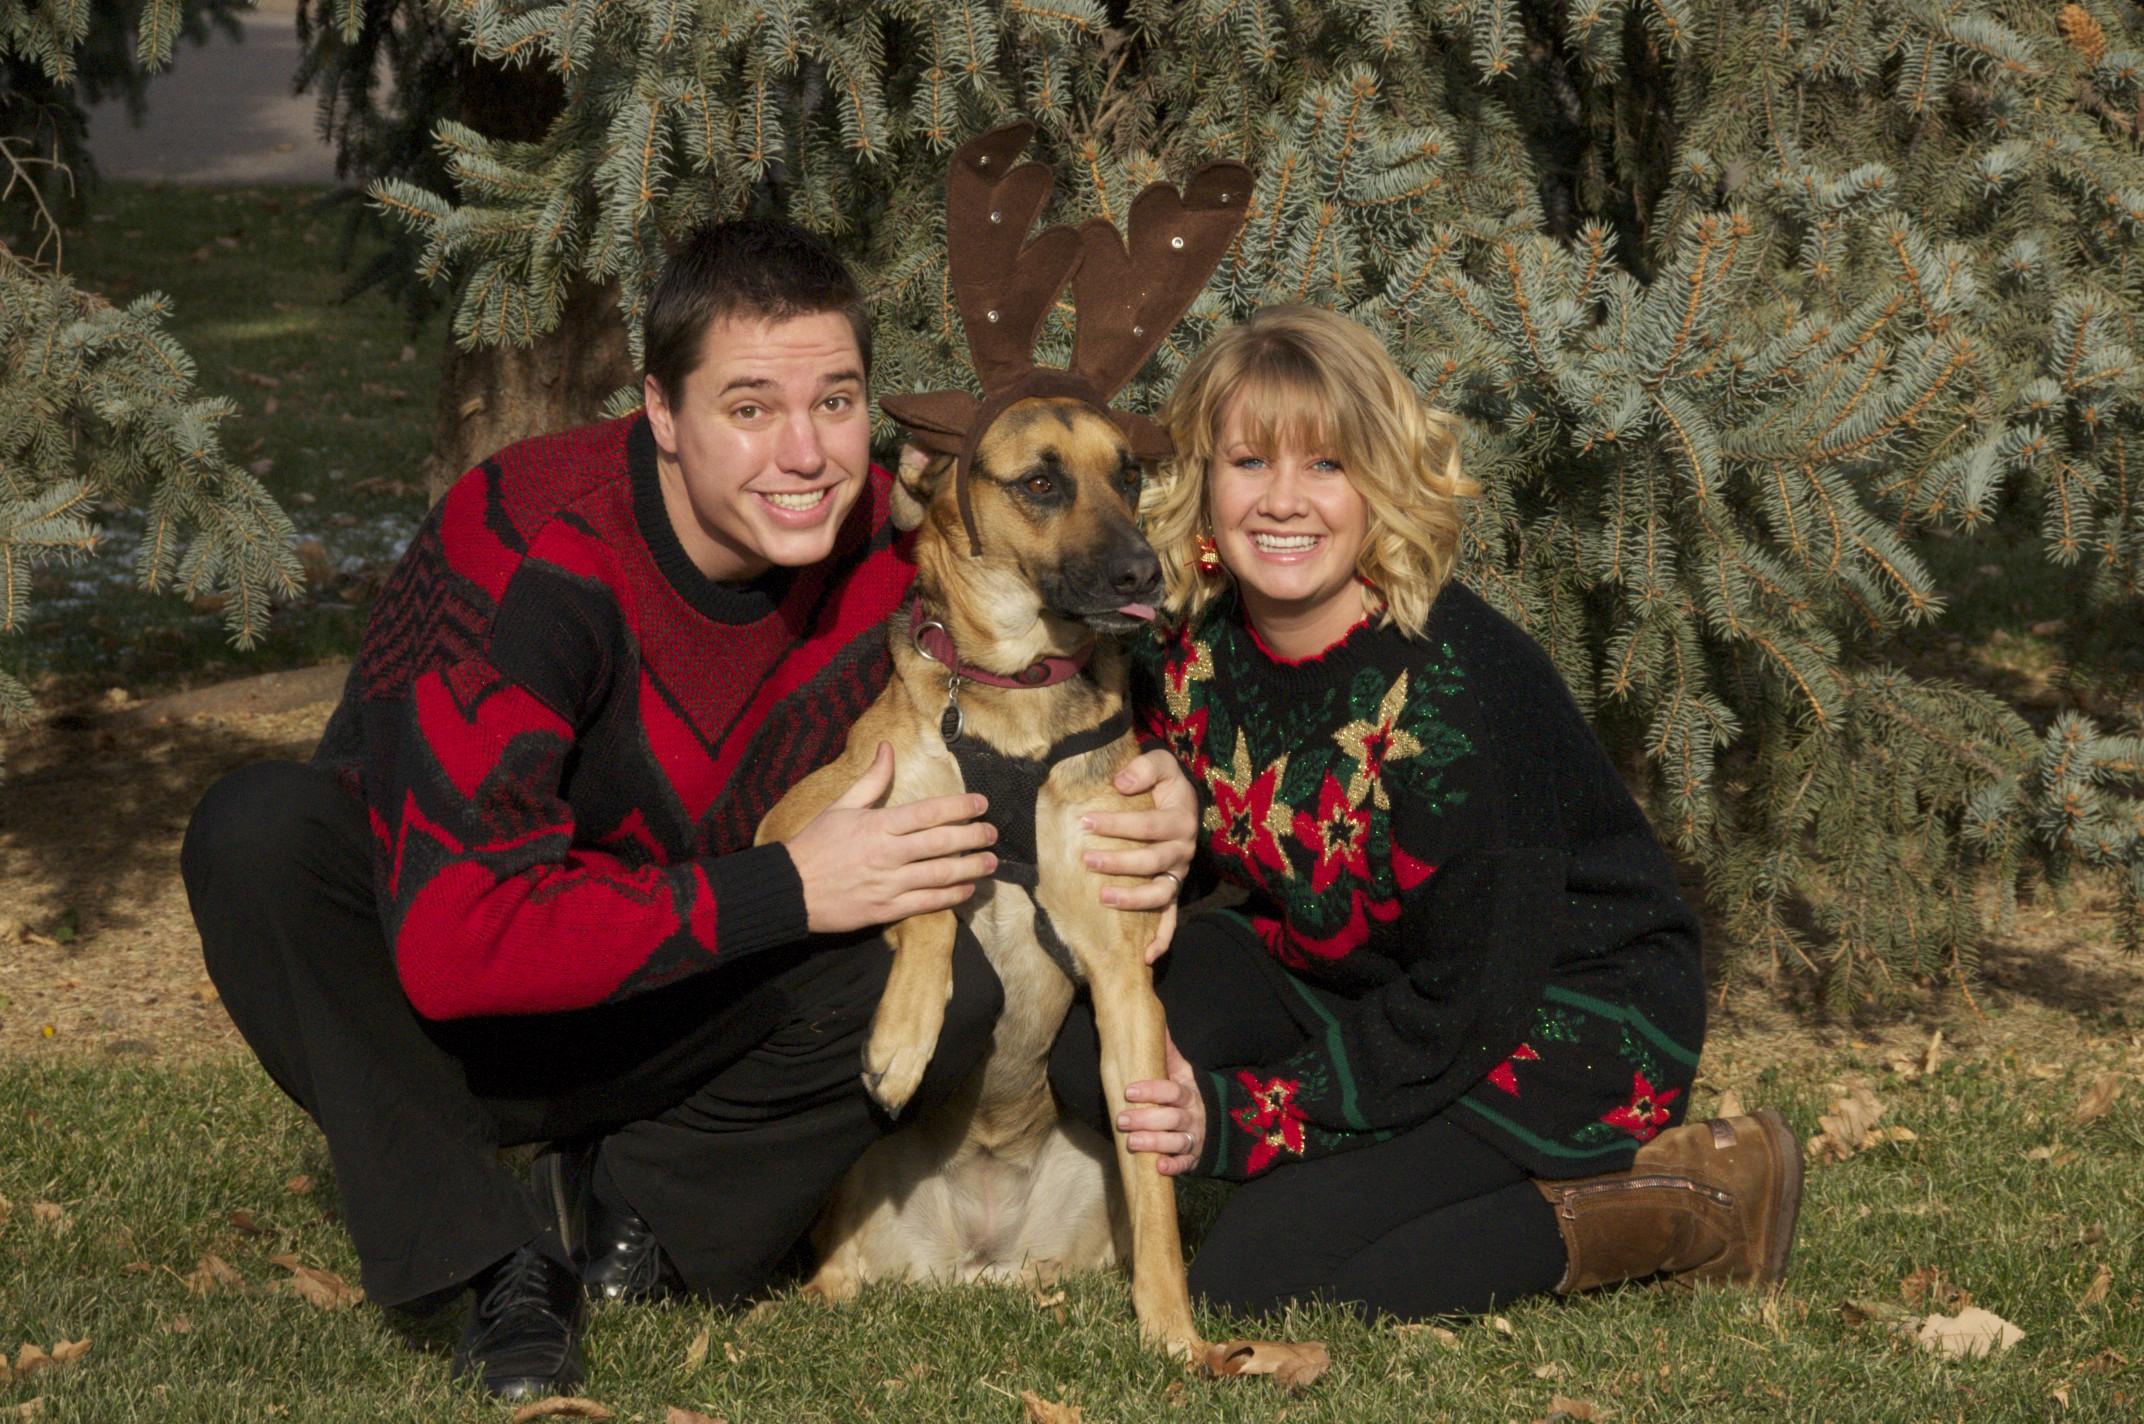 Cheesy Family Christmas Card